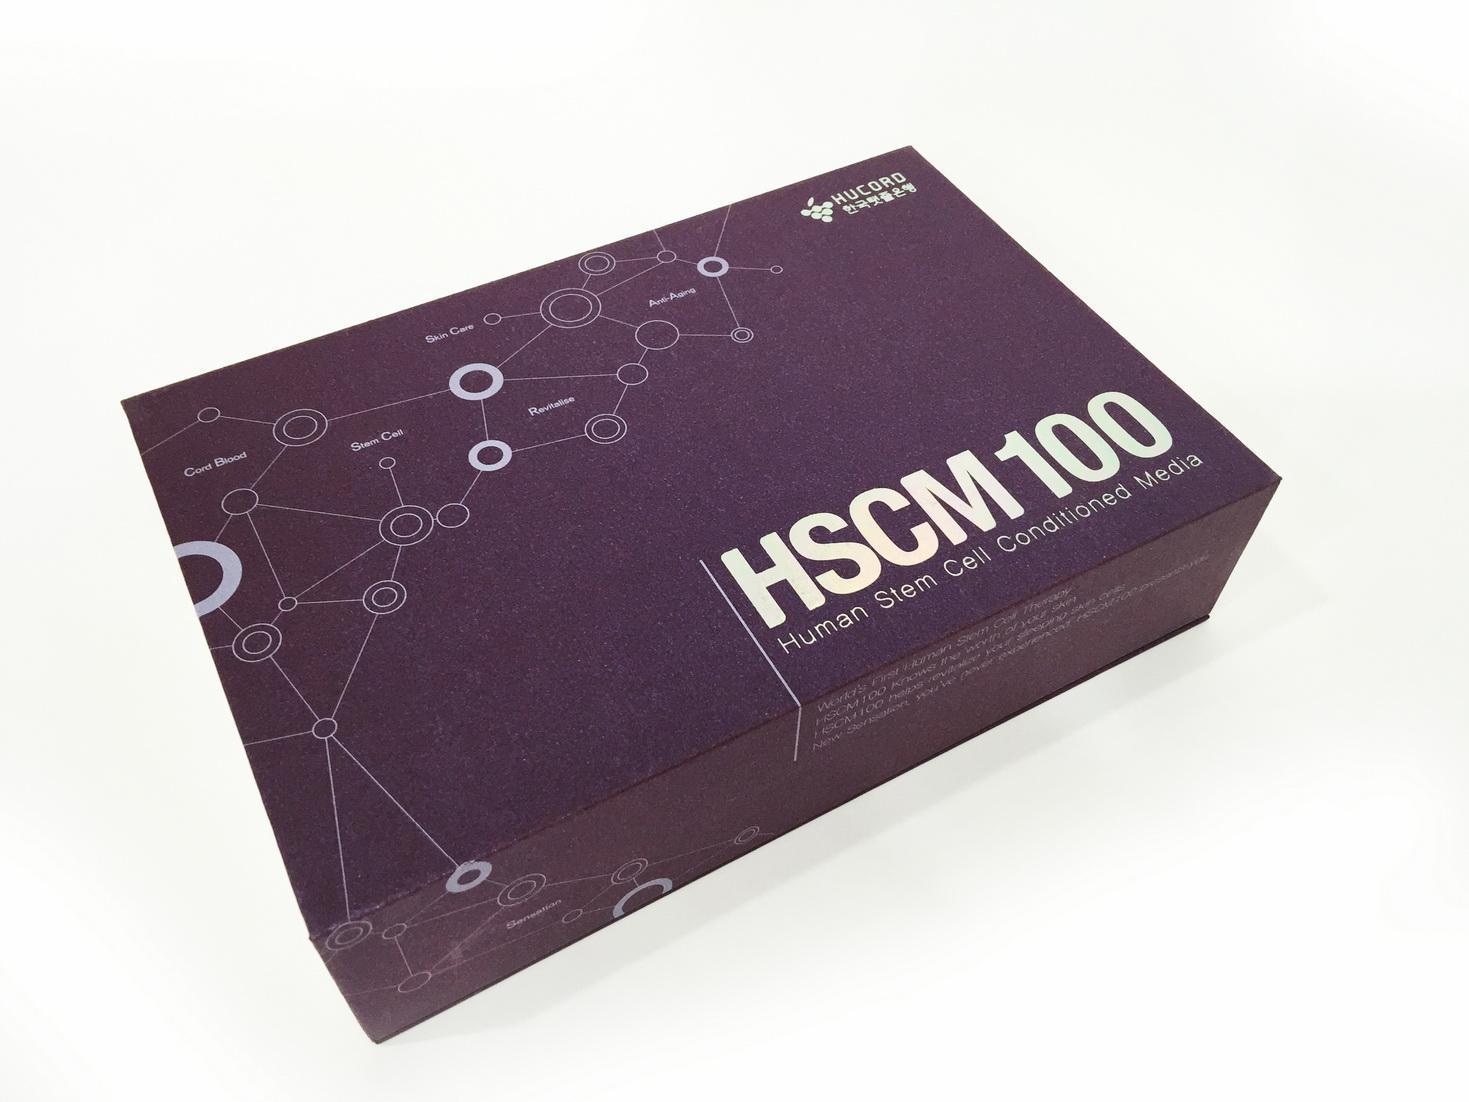 Hucord Hscm-100 Ampoule | Insulin-like Growth Factor-2 Liquid Breastfeeding